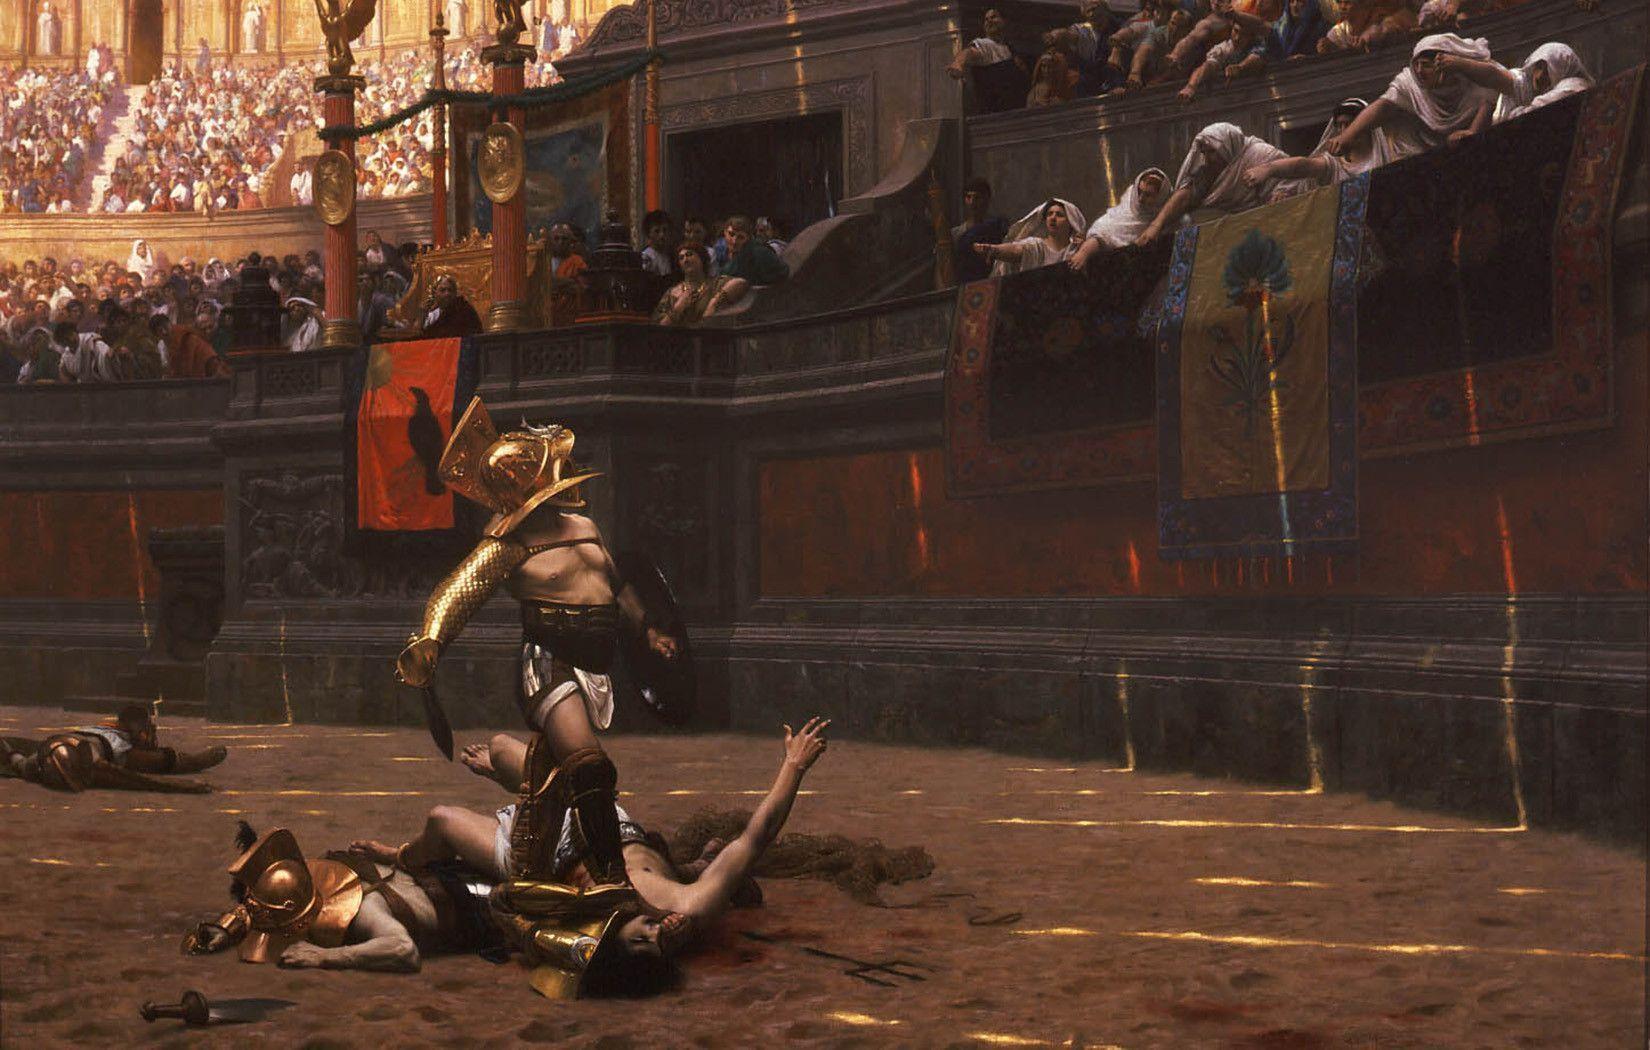 Gladiator Movie Wallpapers - HD Wallpapers Inn